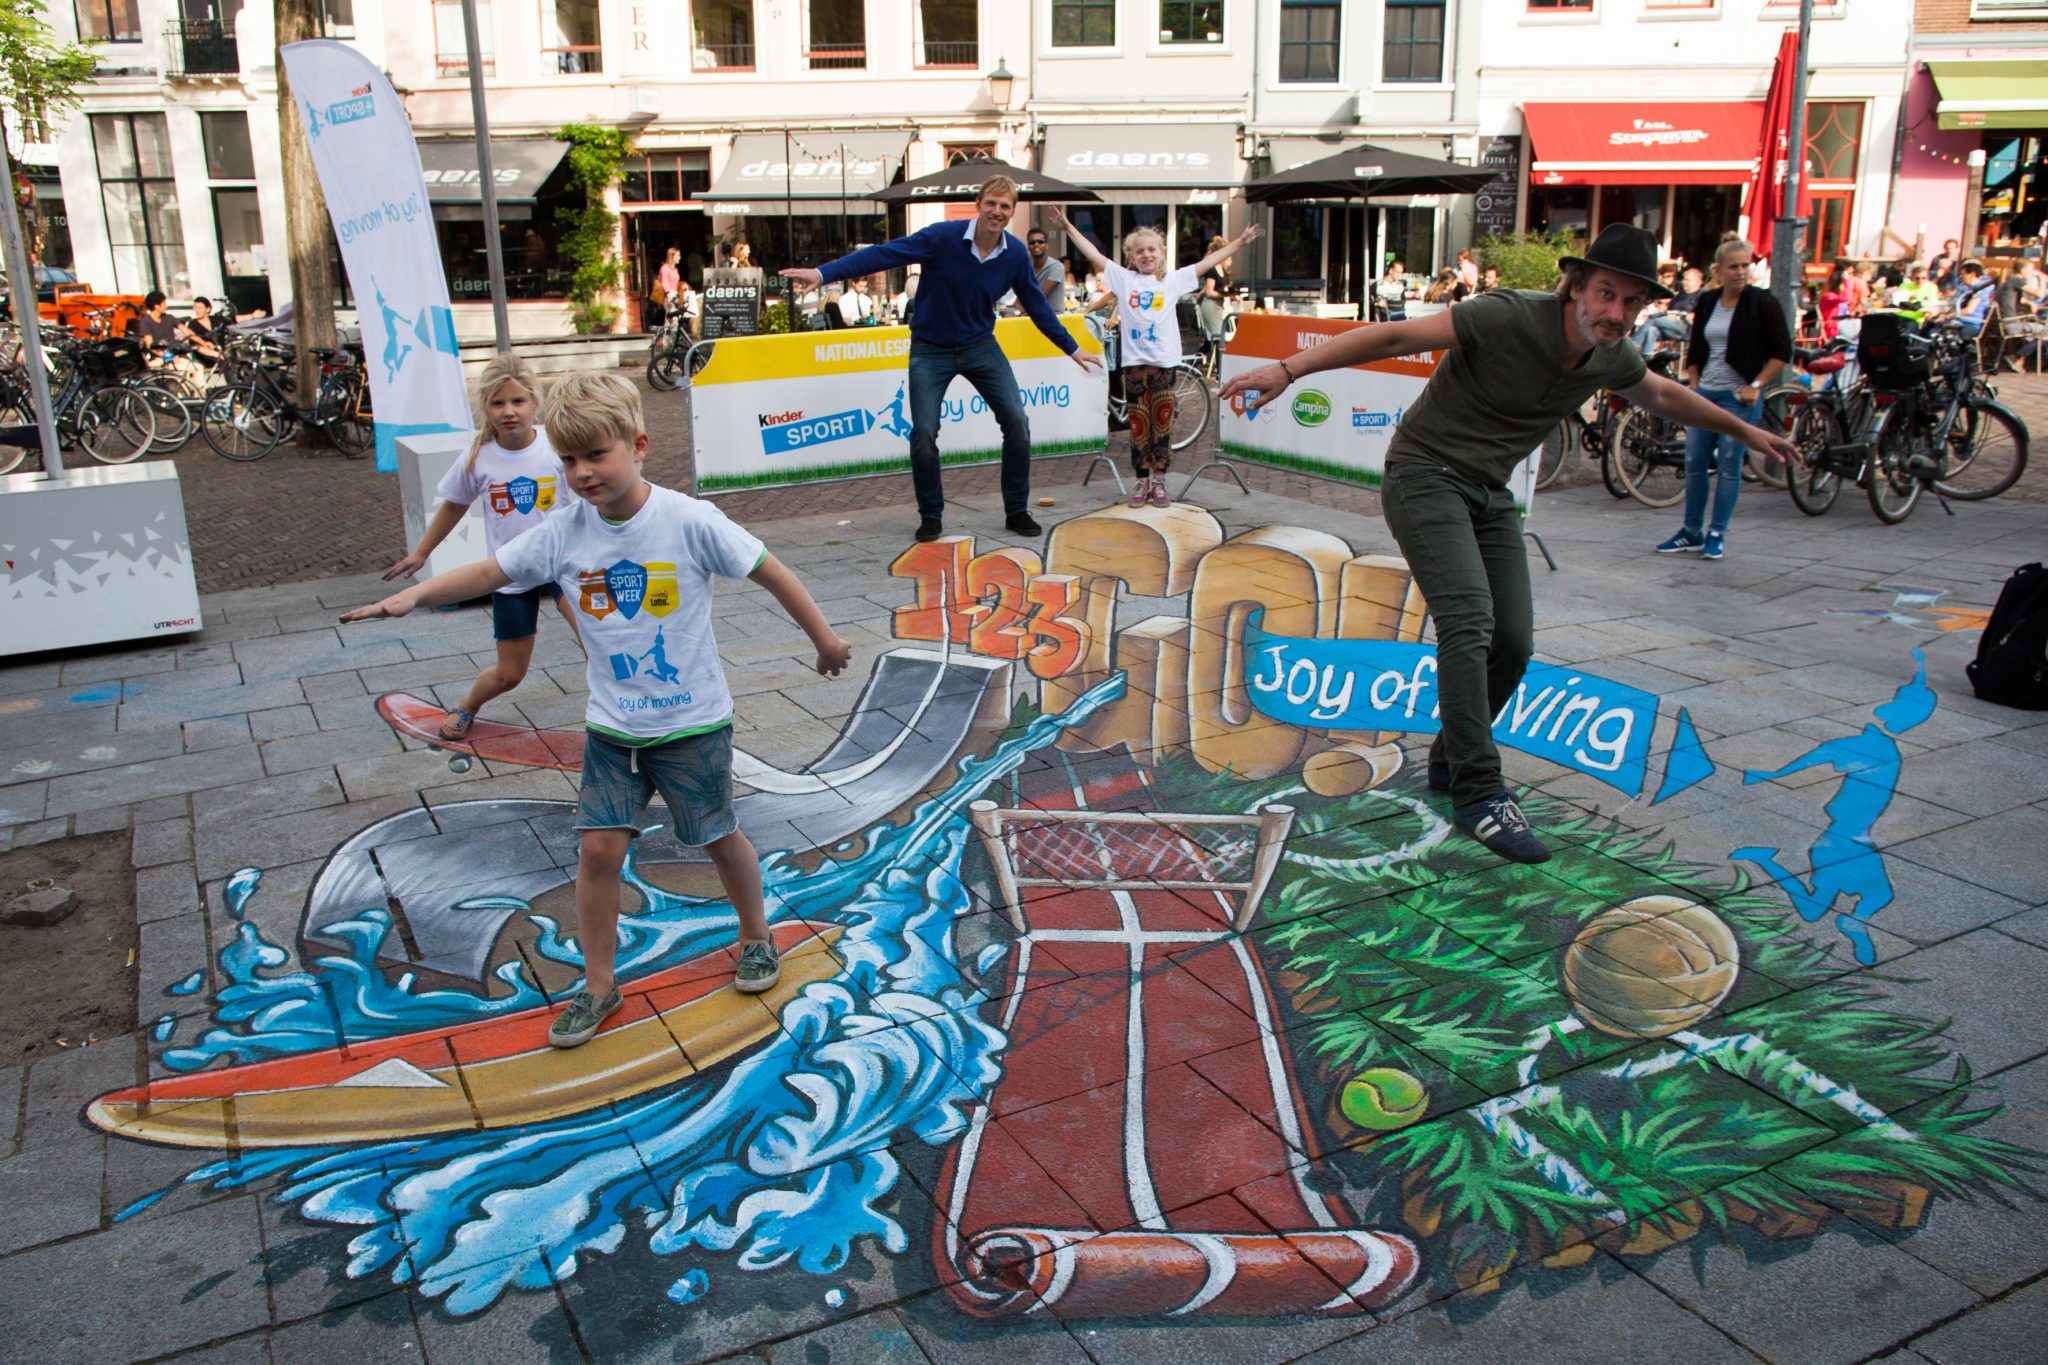 2basics-ferrero-nocnsf-joy-of-moving-streetart